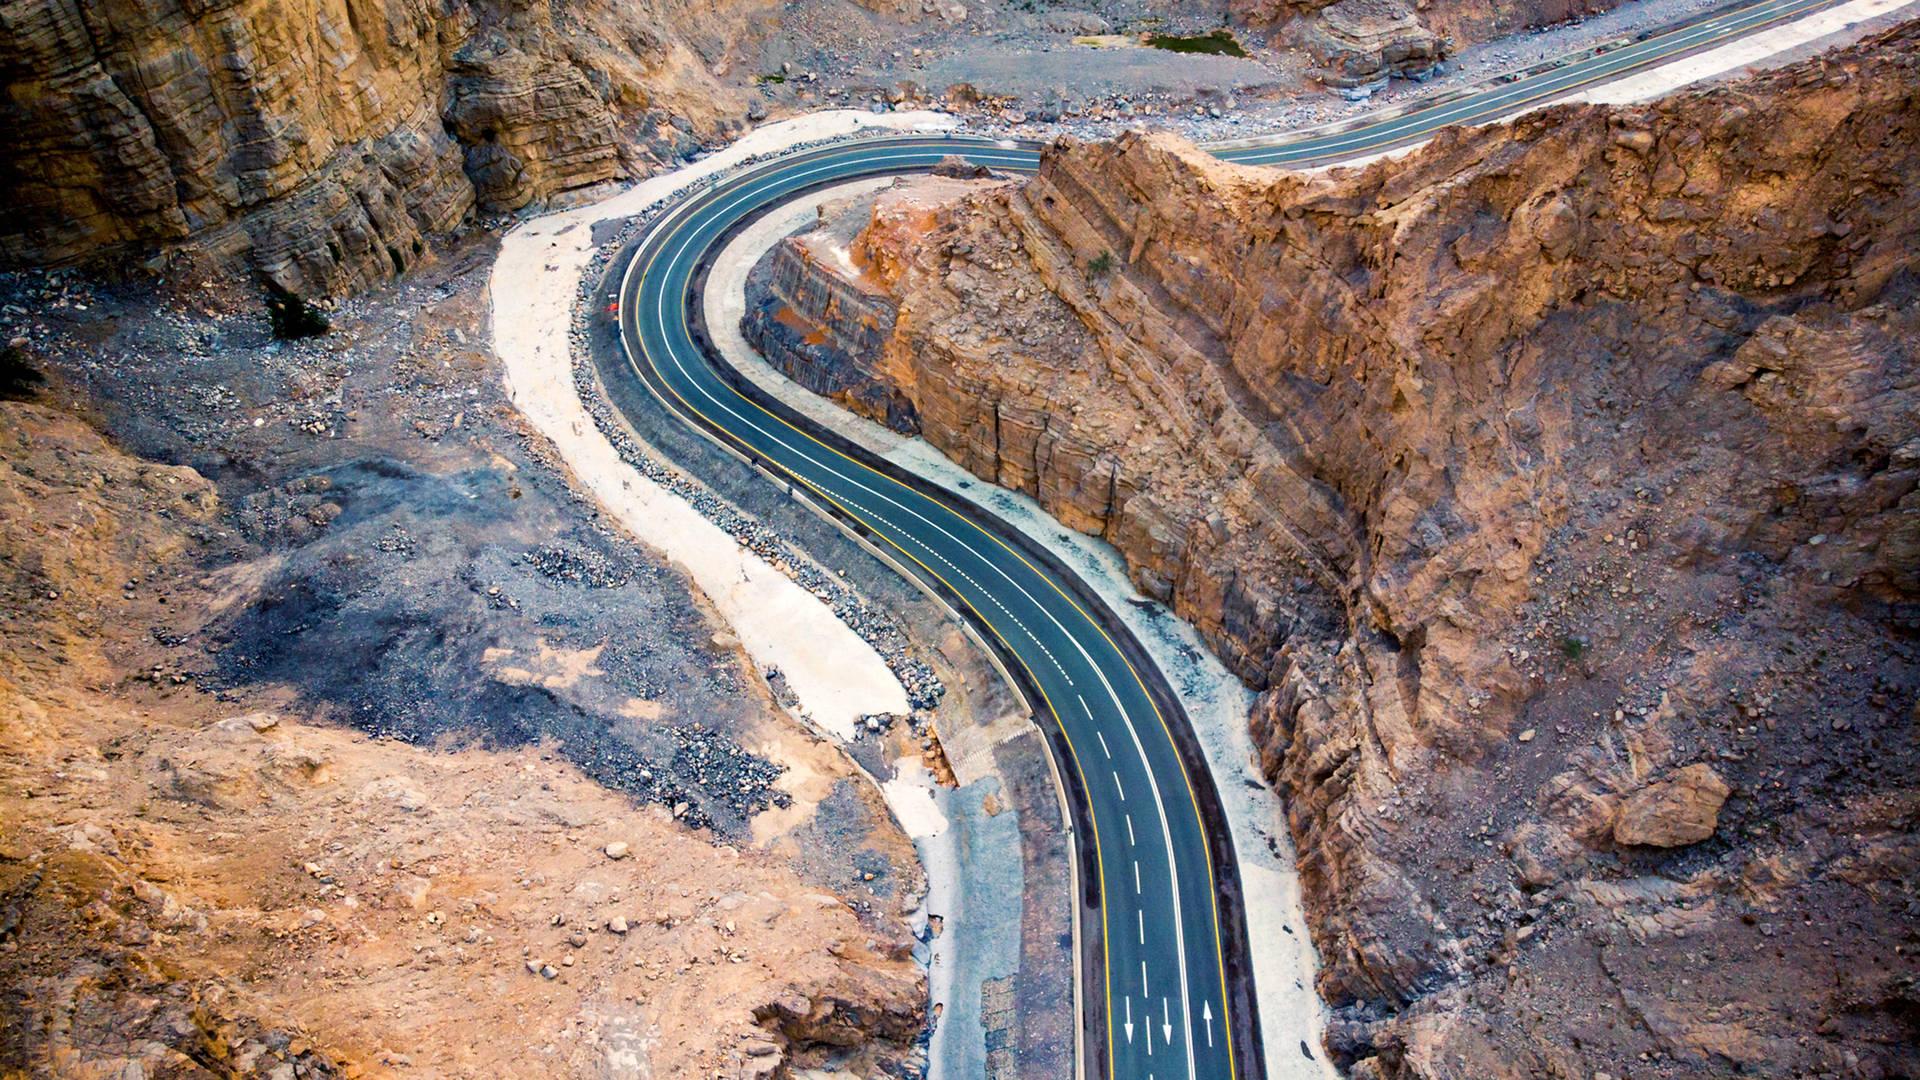 Desert road in the UAE